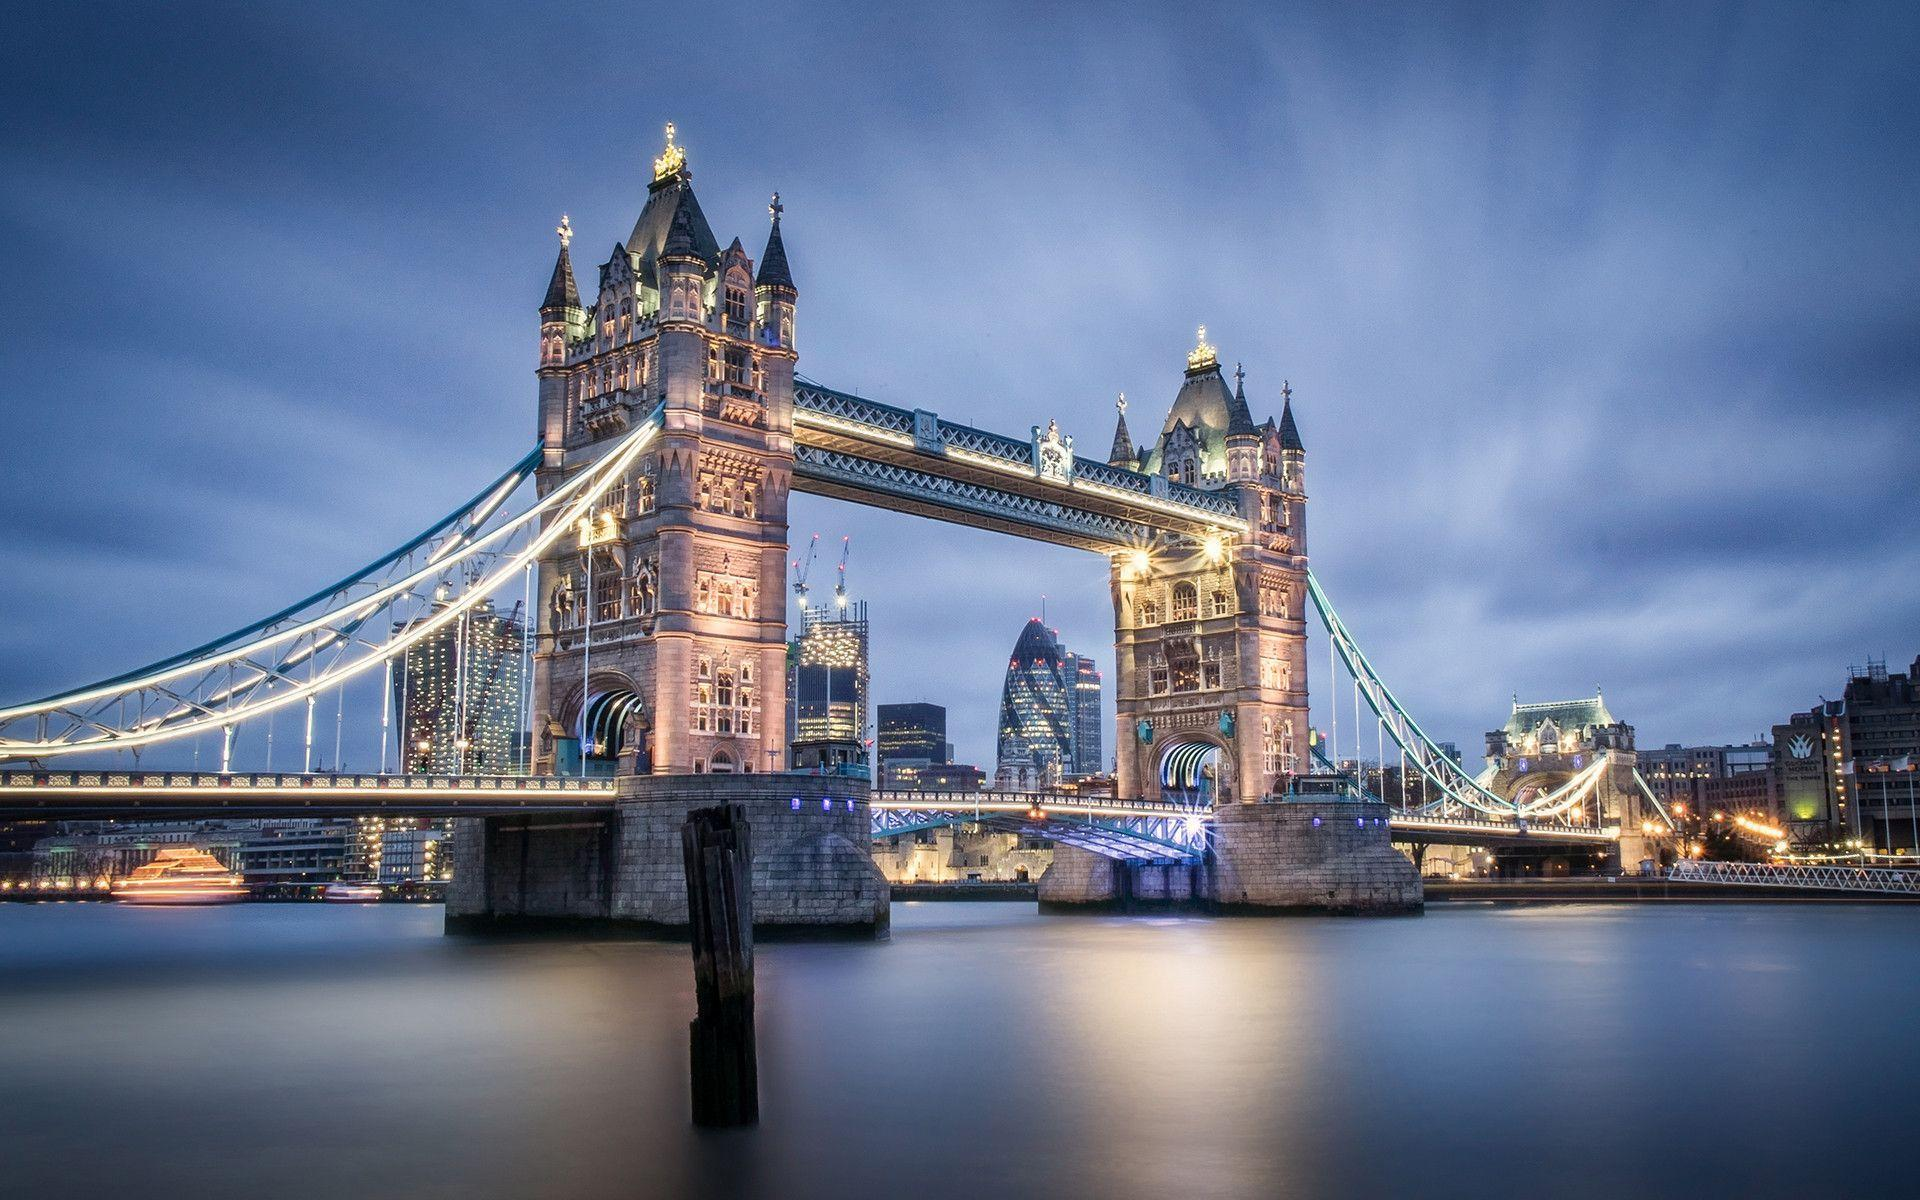 wallpaper bridge london scenic - photo #4